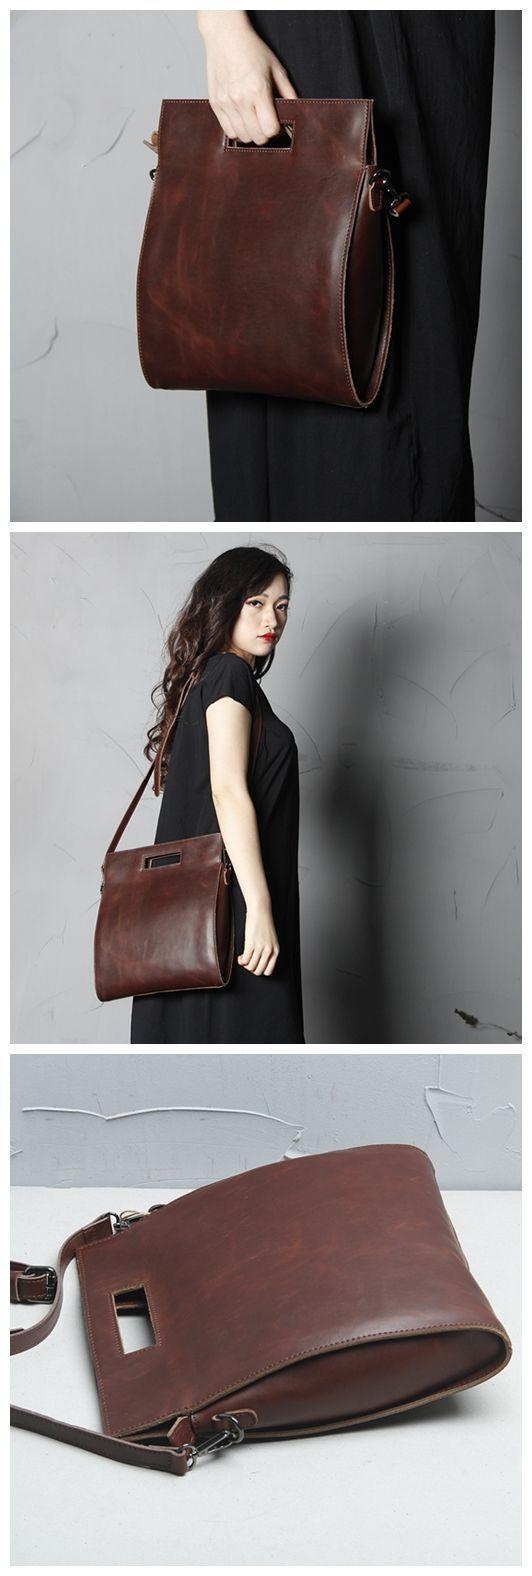 WOMEN TOTE, SHOPPING BAG, WOMEN FASHION, ELEGANT BAG, SHOULDER BAG, CUSTOM…